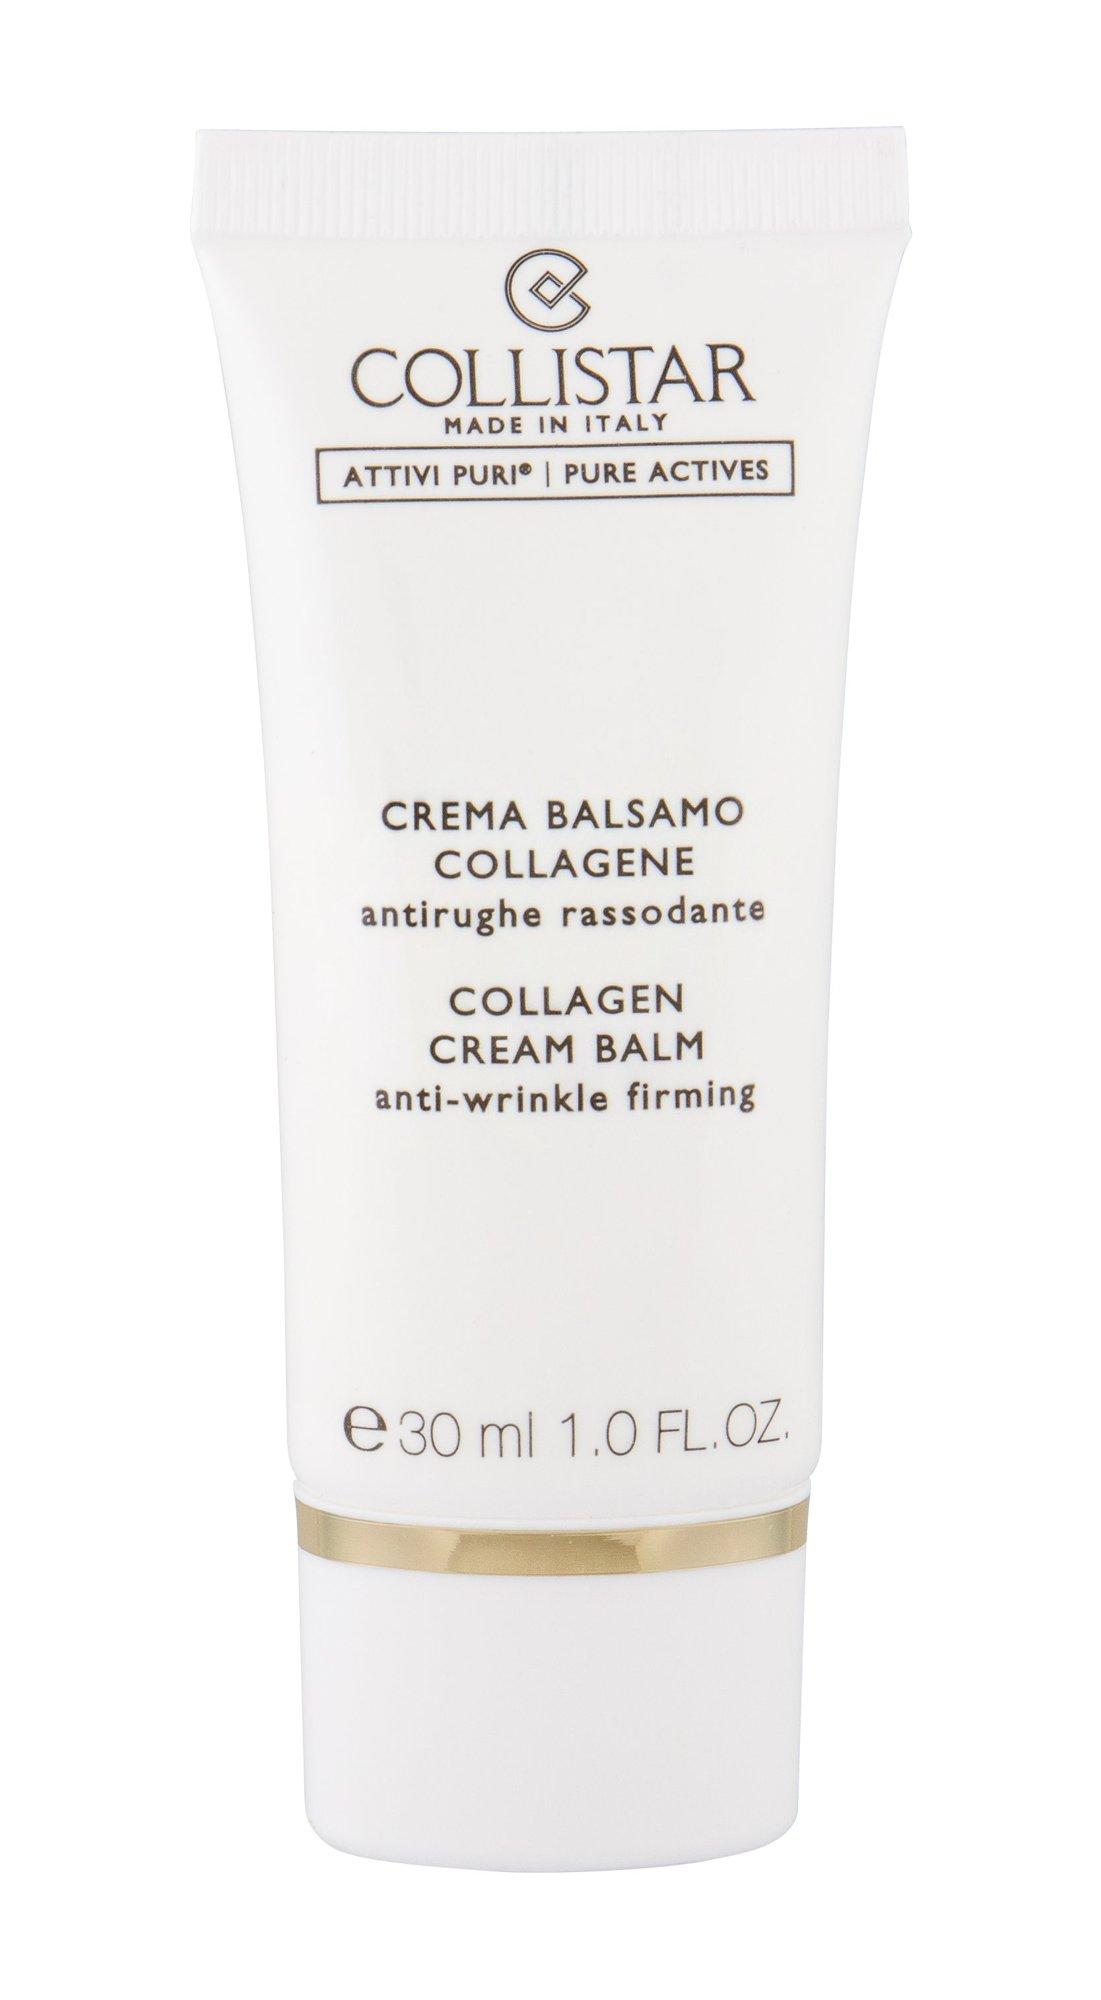 Collistar Pure Actives Day Cream 30ml